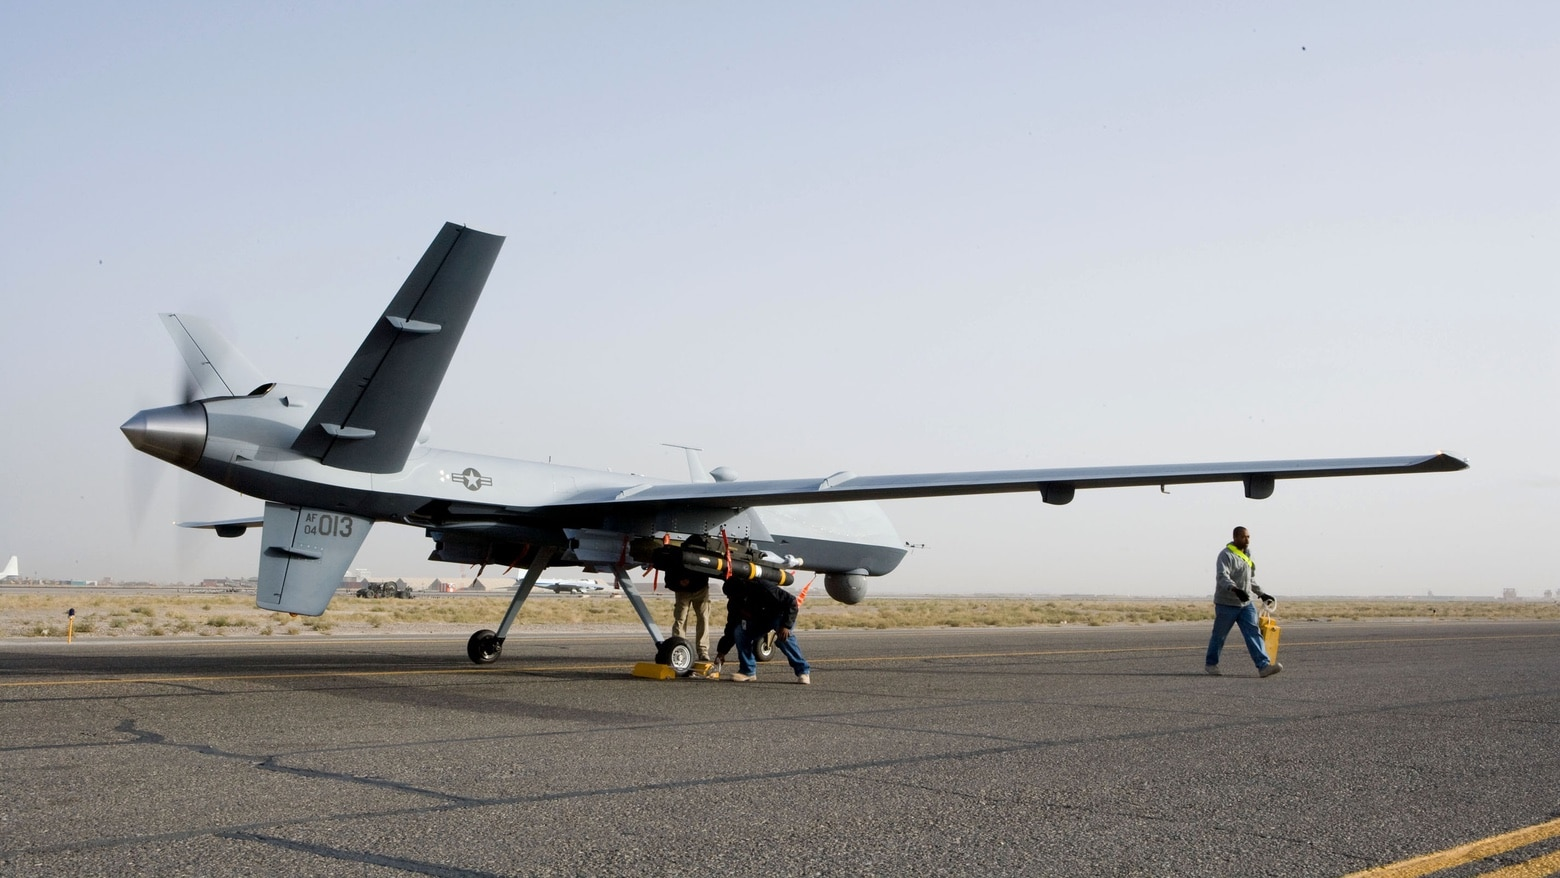 A MQ-9 Reaper drone won't ever have Apple AI software.